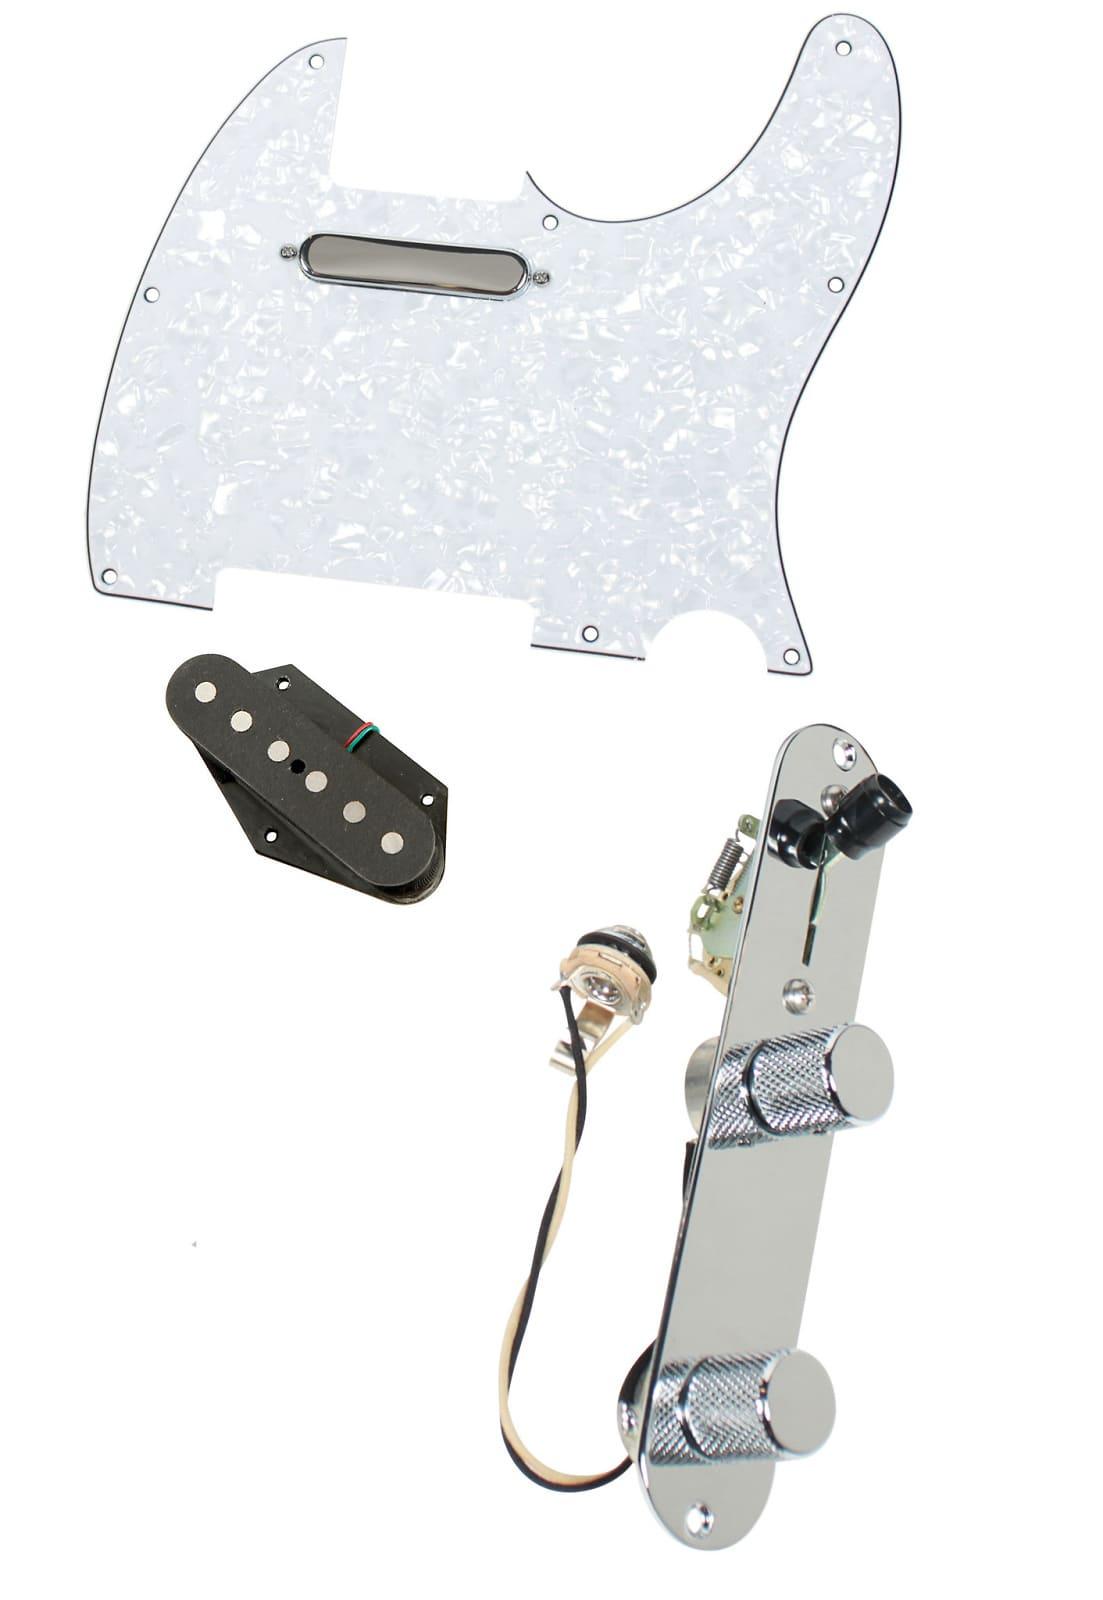 fender tele telecaster loaded pre wired pickguard dimarzio reverb. Black Bedroom Furniture Sets. Home Design Ideas